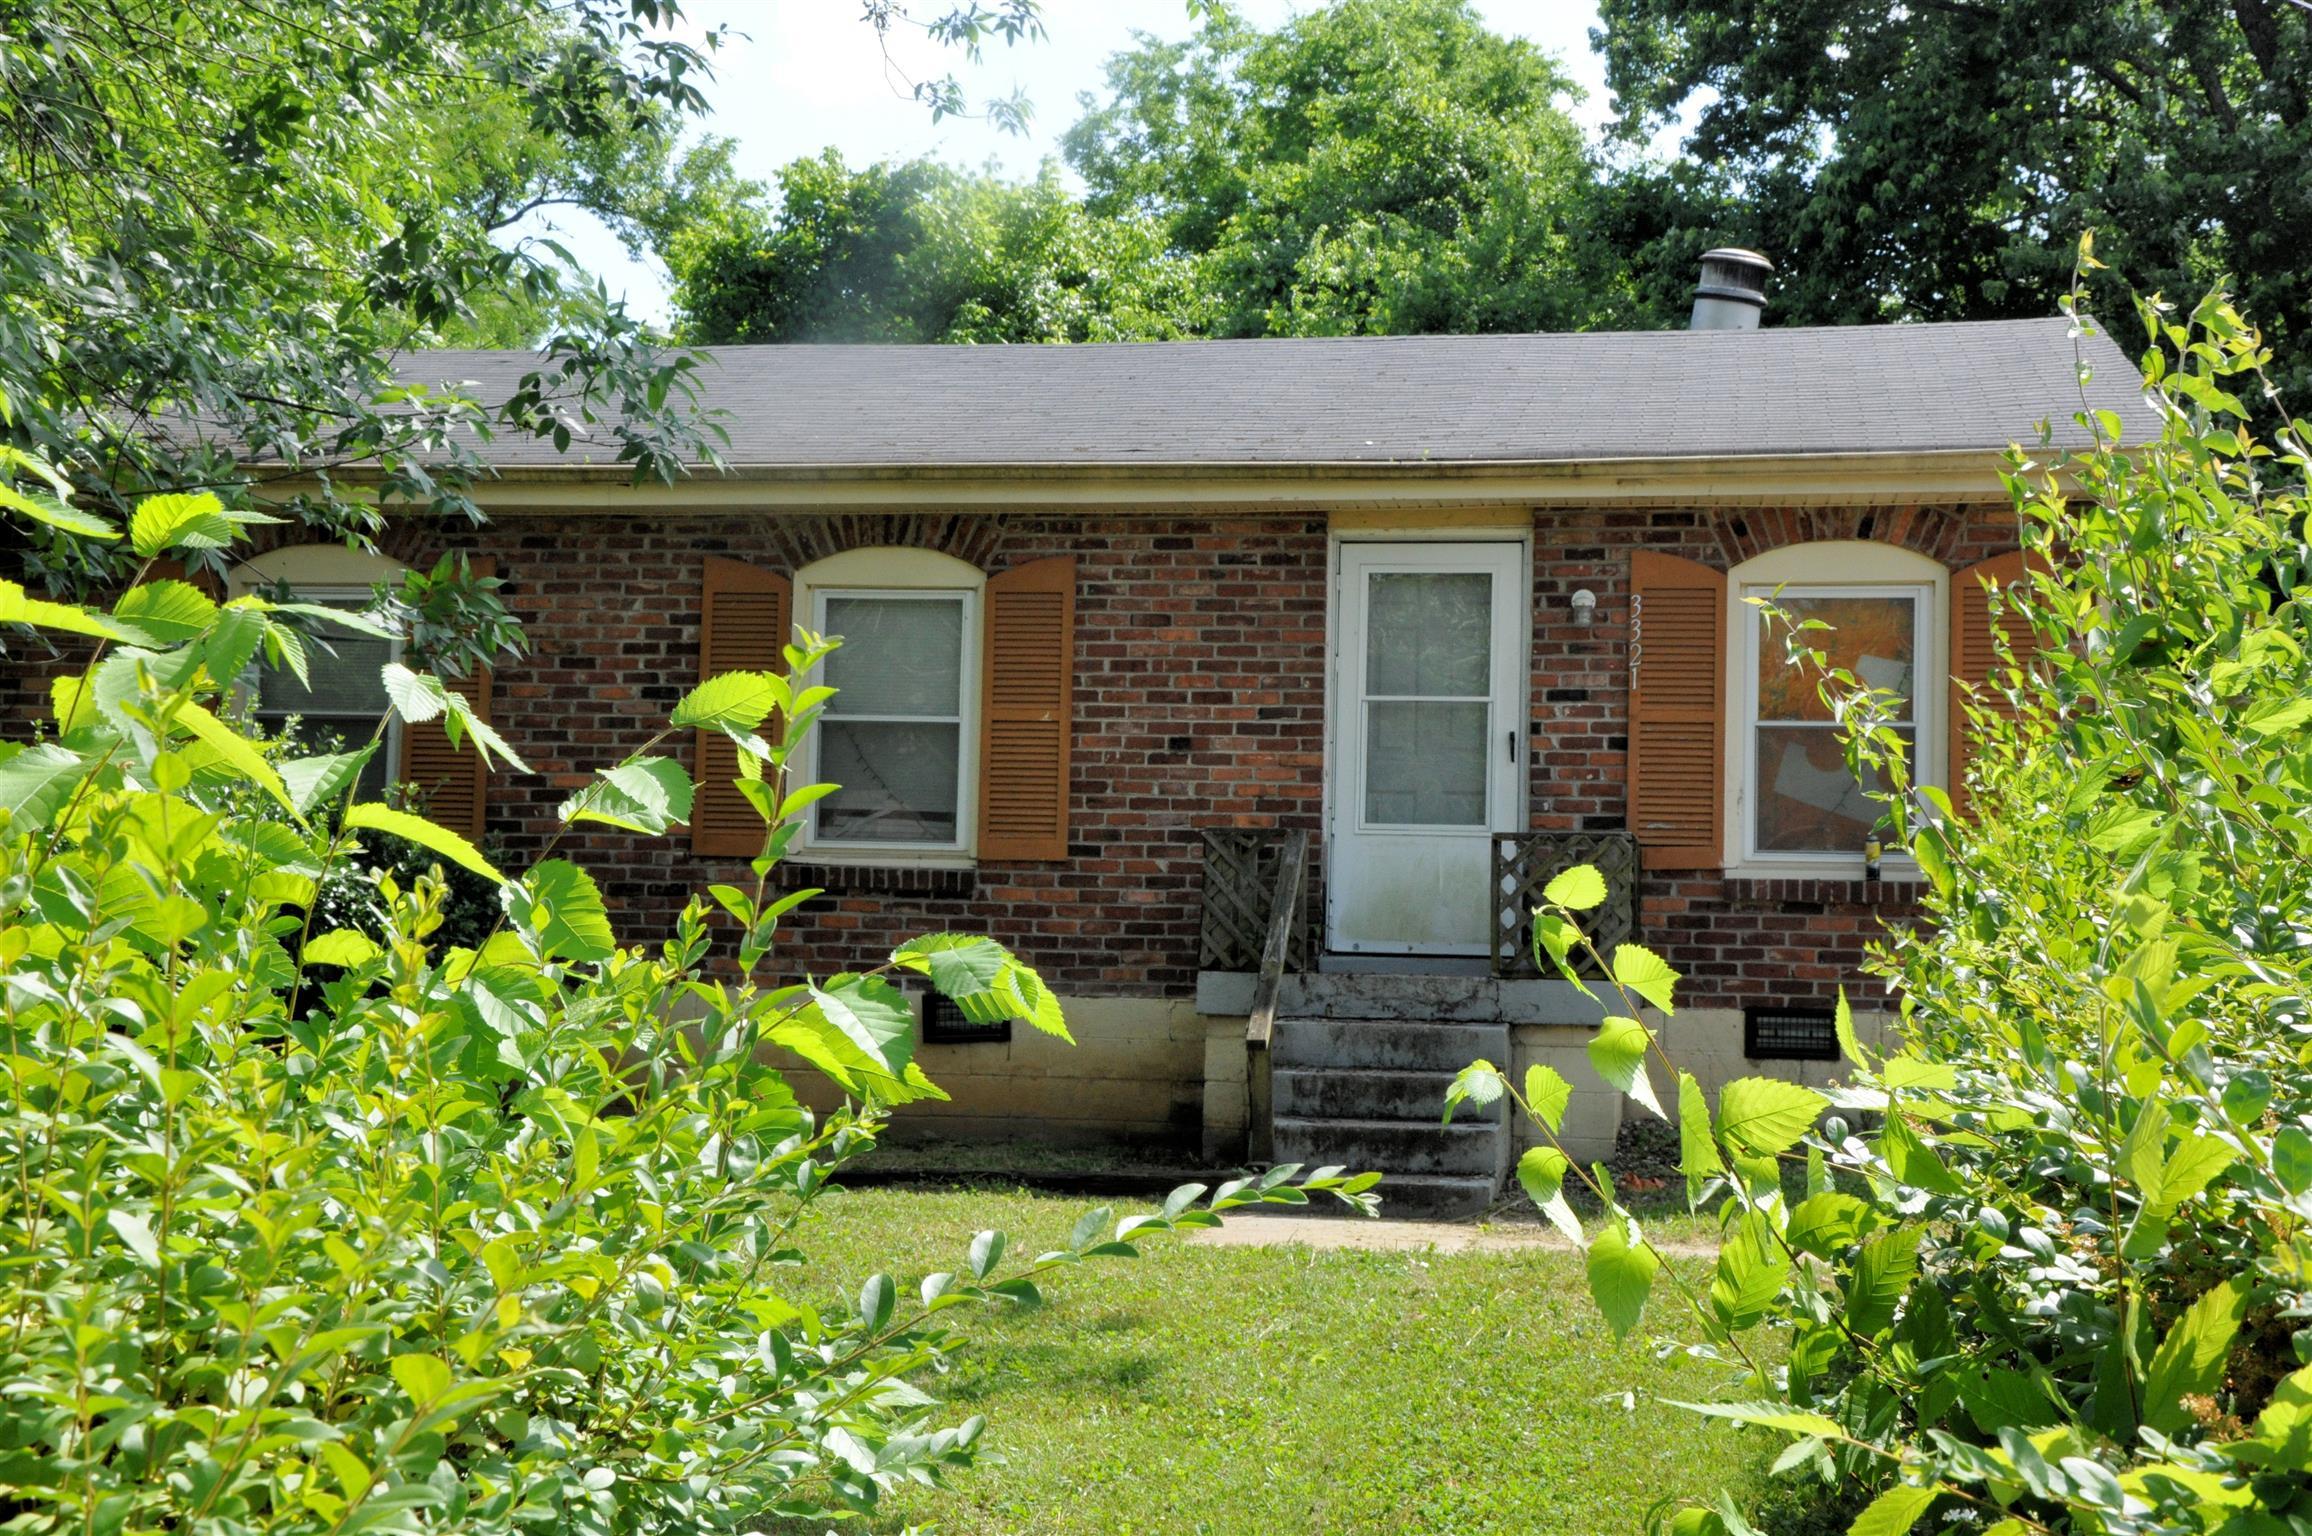 3321 Olsen Ln, Nashville, TN 37218 - Nashville, TN real estate listing